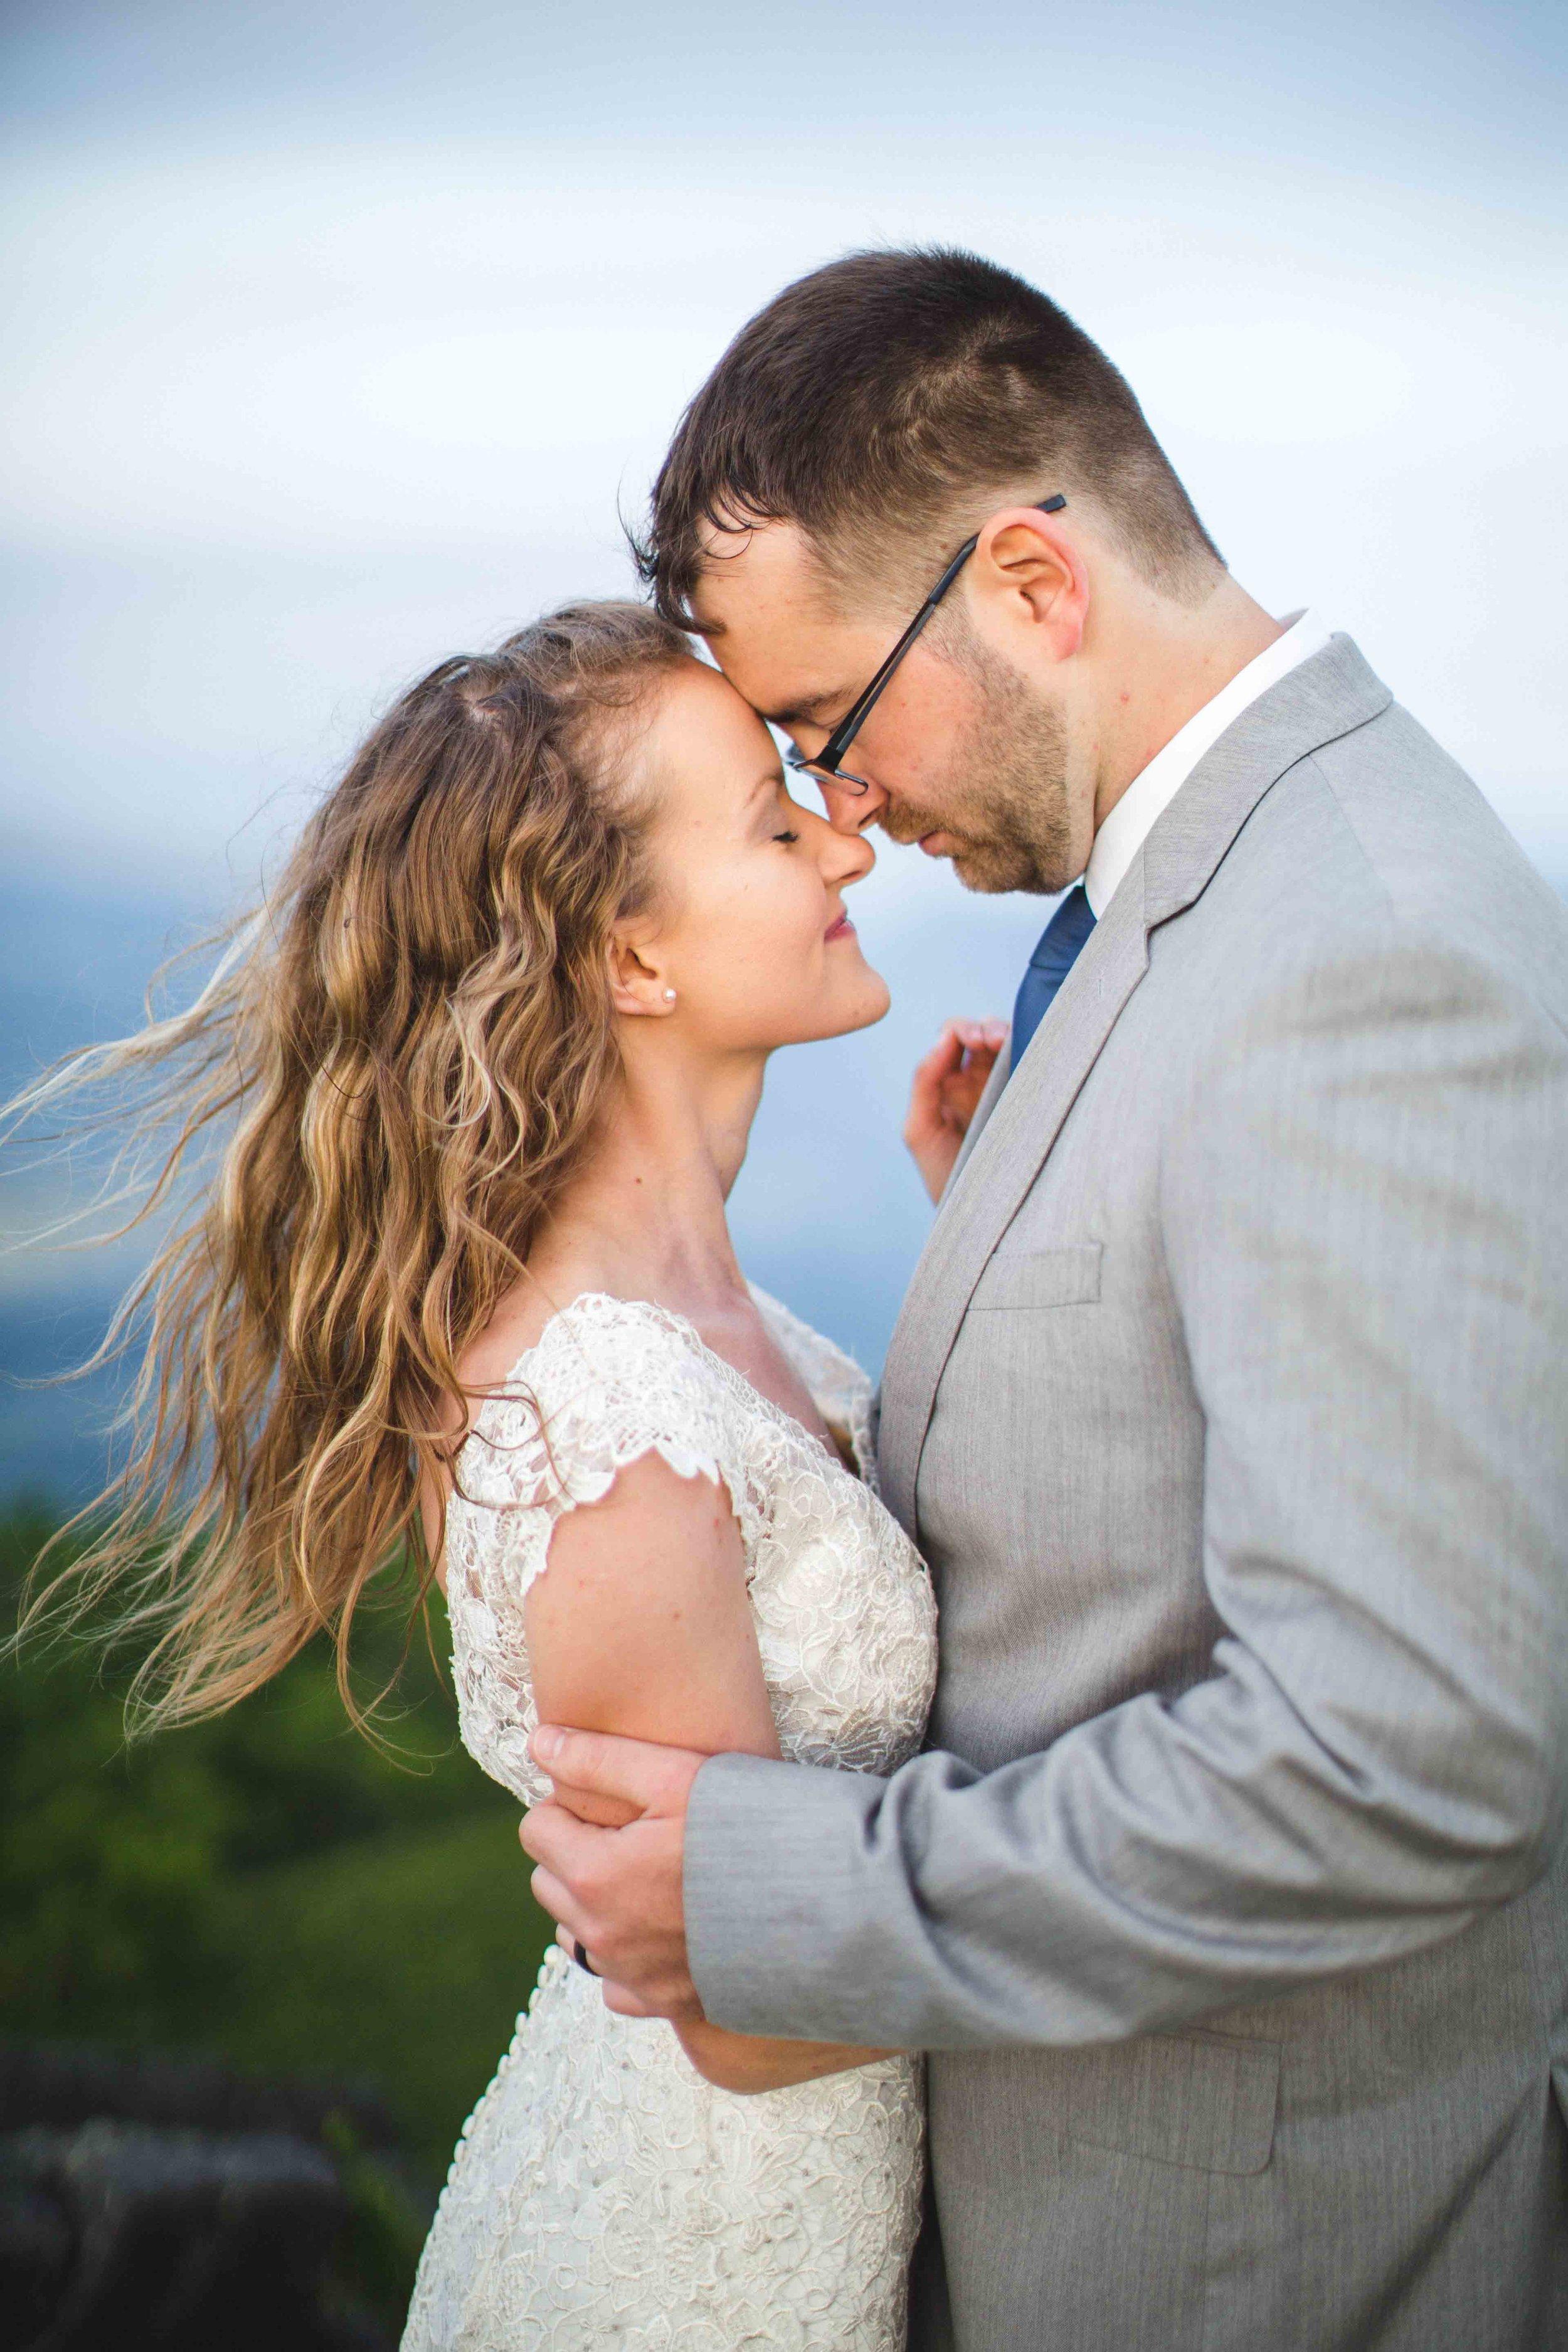 north-carolina-elopement-photographer-77.jpg